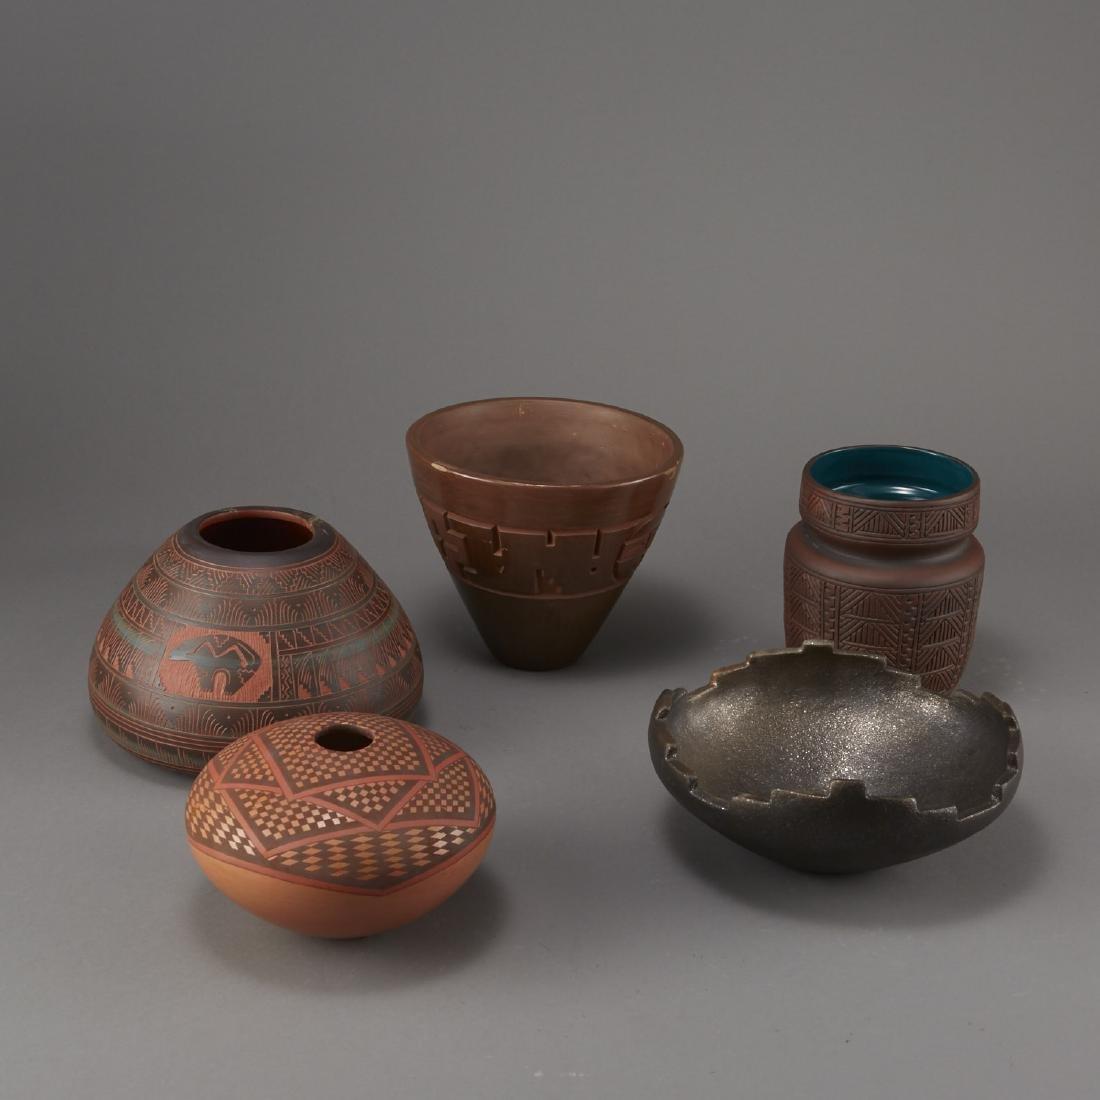 5 Pieces of Native American Pottery Sheldon Nunez - 4